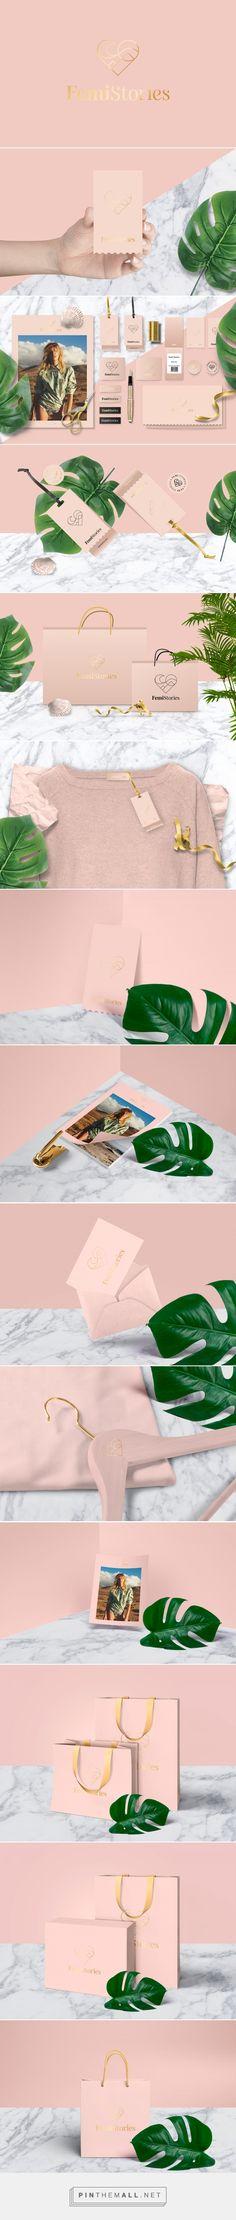 Femi Stories Womens Fashion Branding by Lange & Lange | Fivestar Branding Agency – Design and Branding Agency & Curated Inspiration Gallery